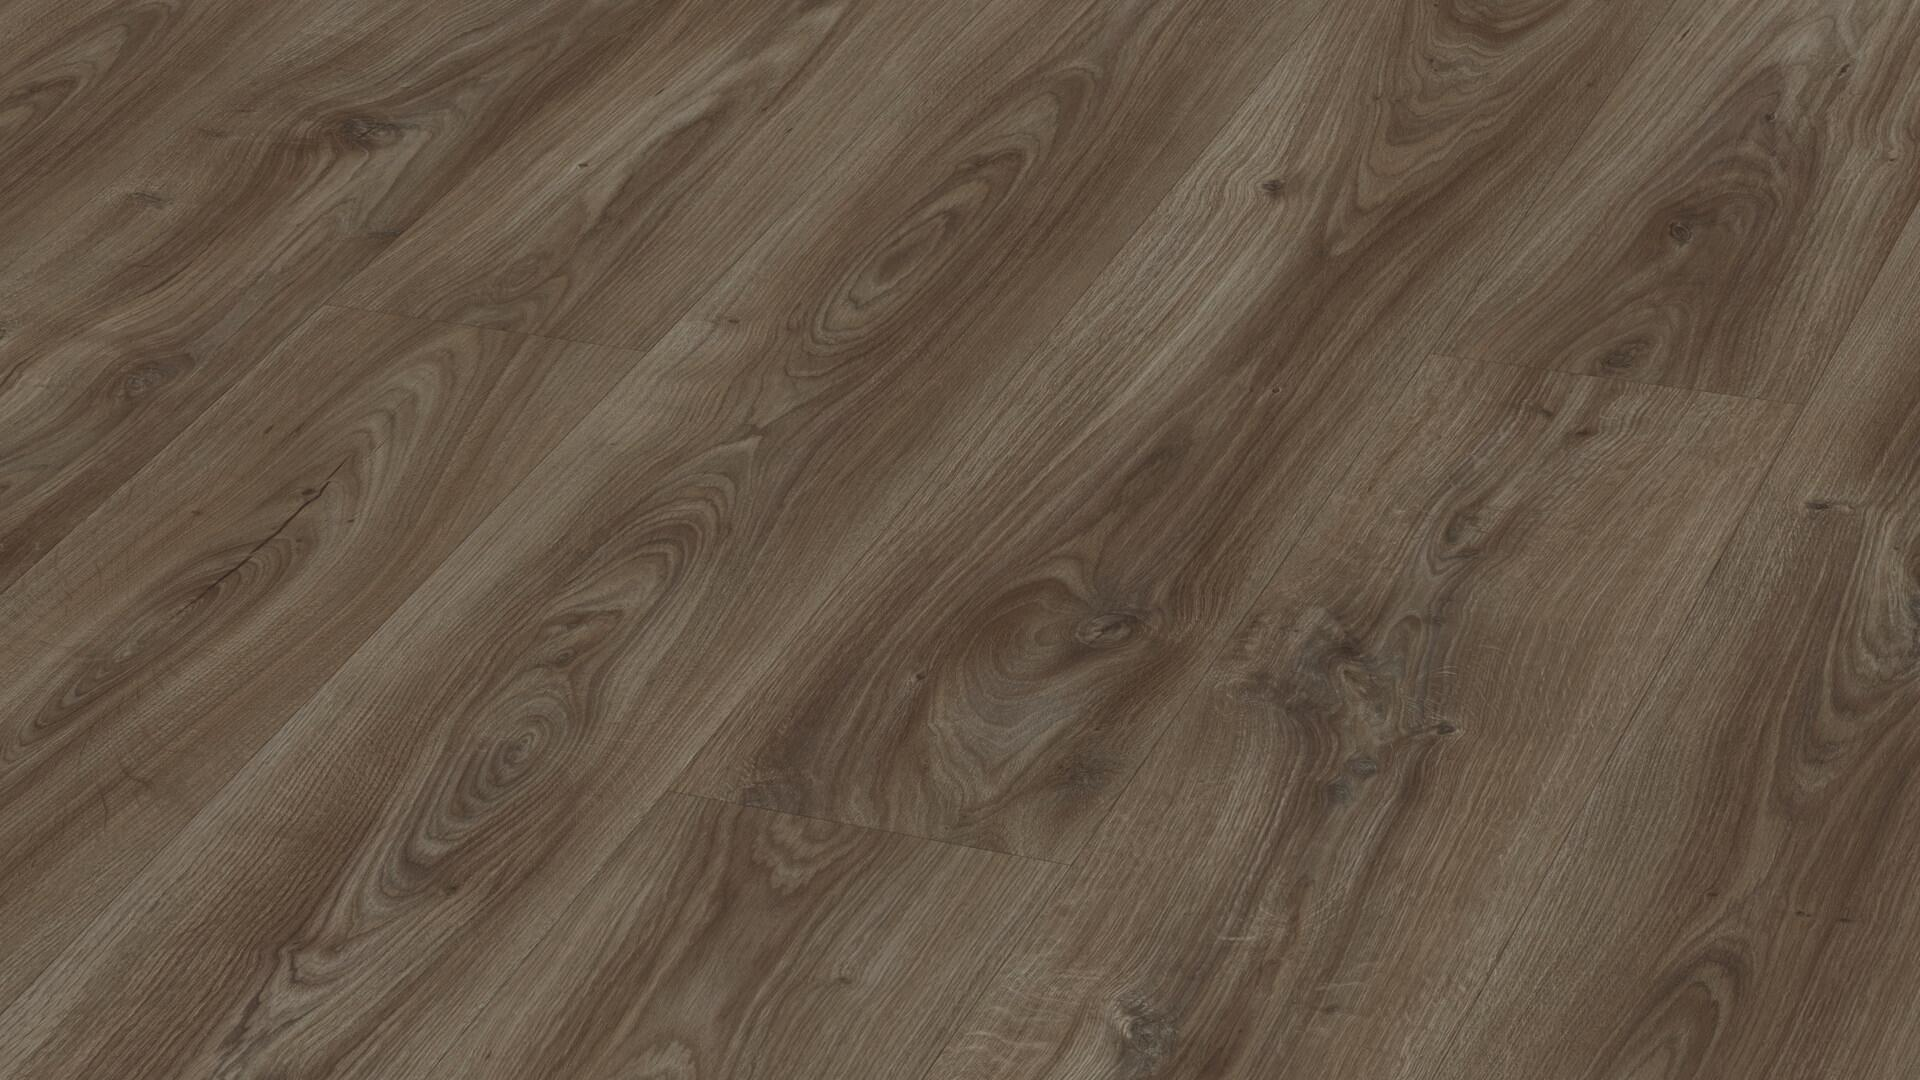 Design flooring MeisterDesign. life® DL 800 Dark castle oak 6842